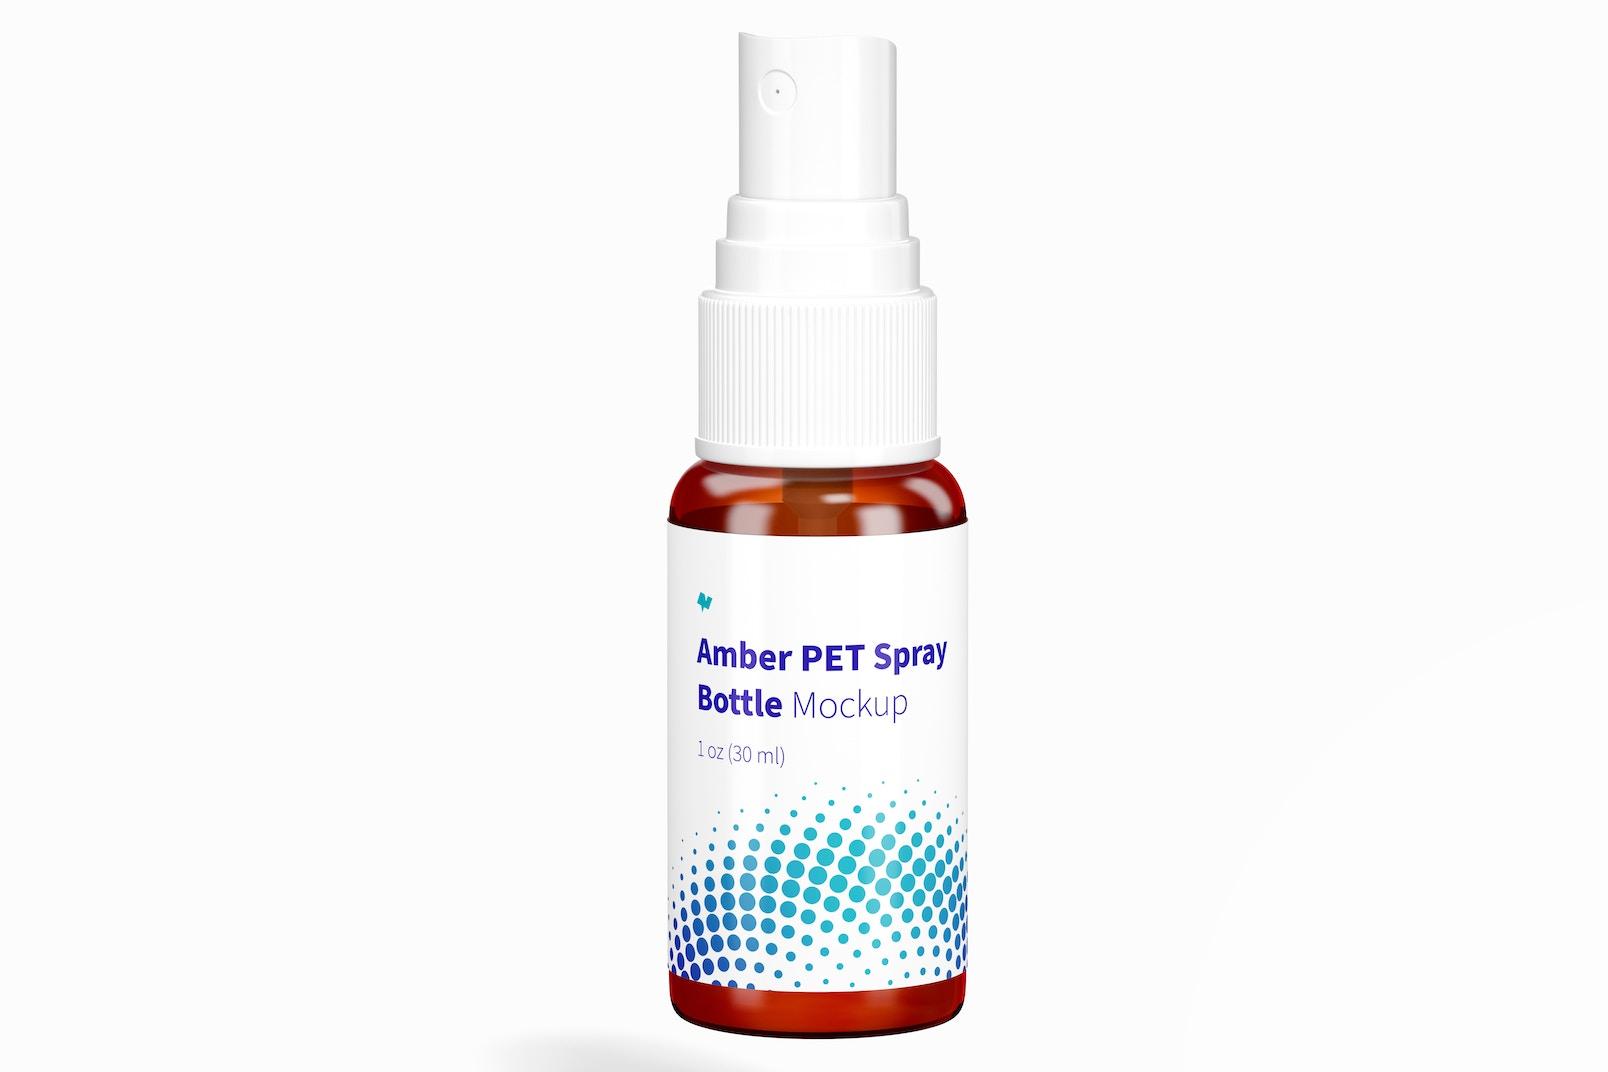 1 oz Amber PET Spray Bottle Mockup